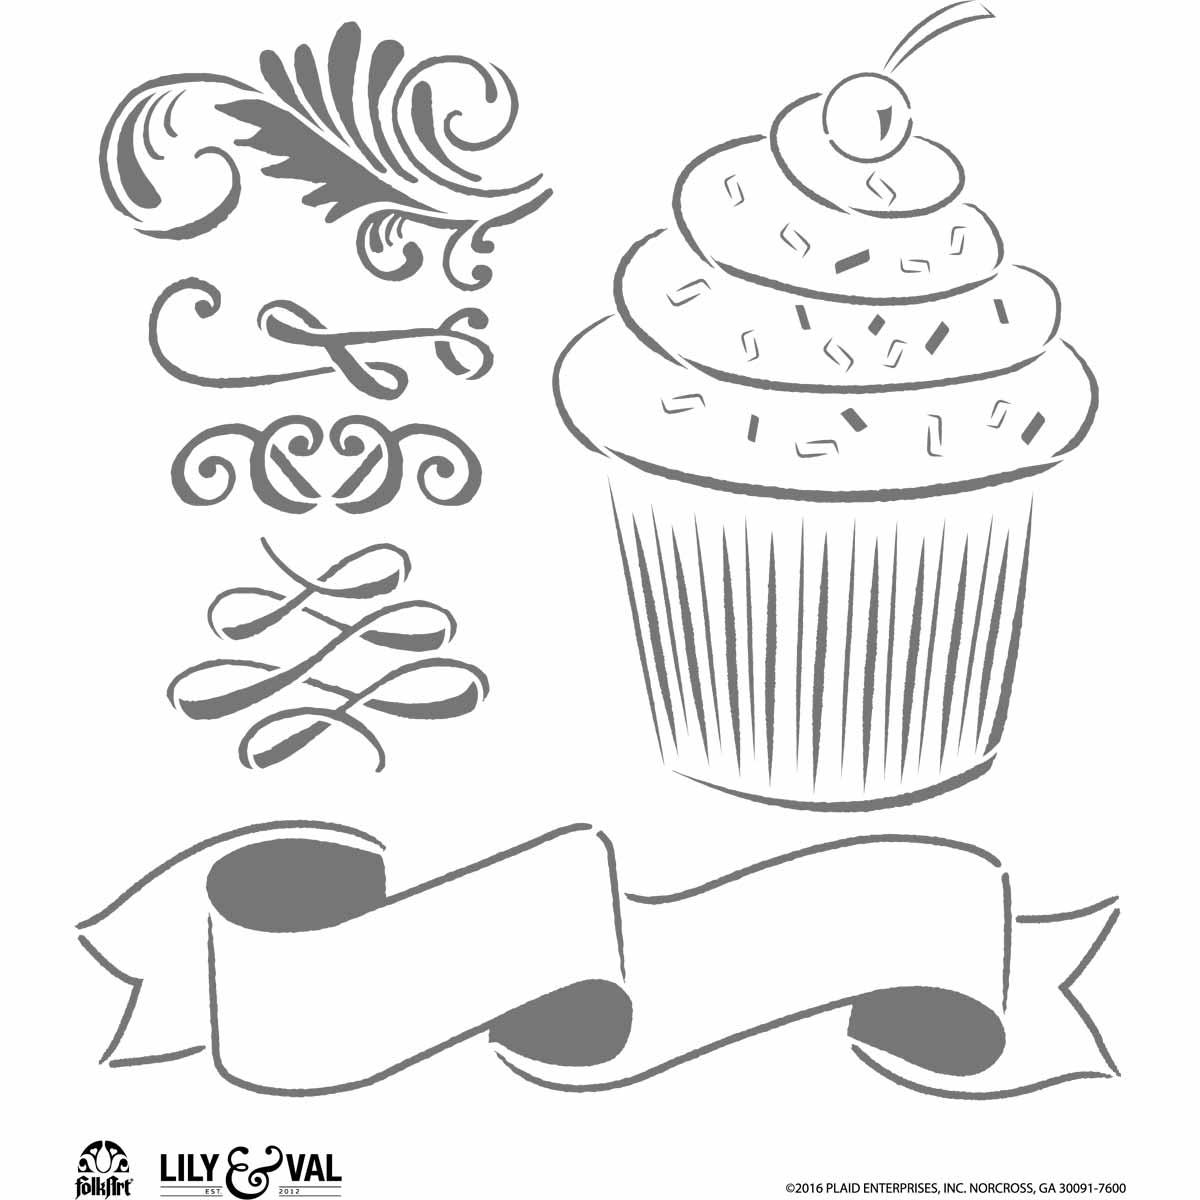 FolkArt ® Lily & Val™ Stencils - Variety Packs - Cupcake - 13250